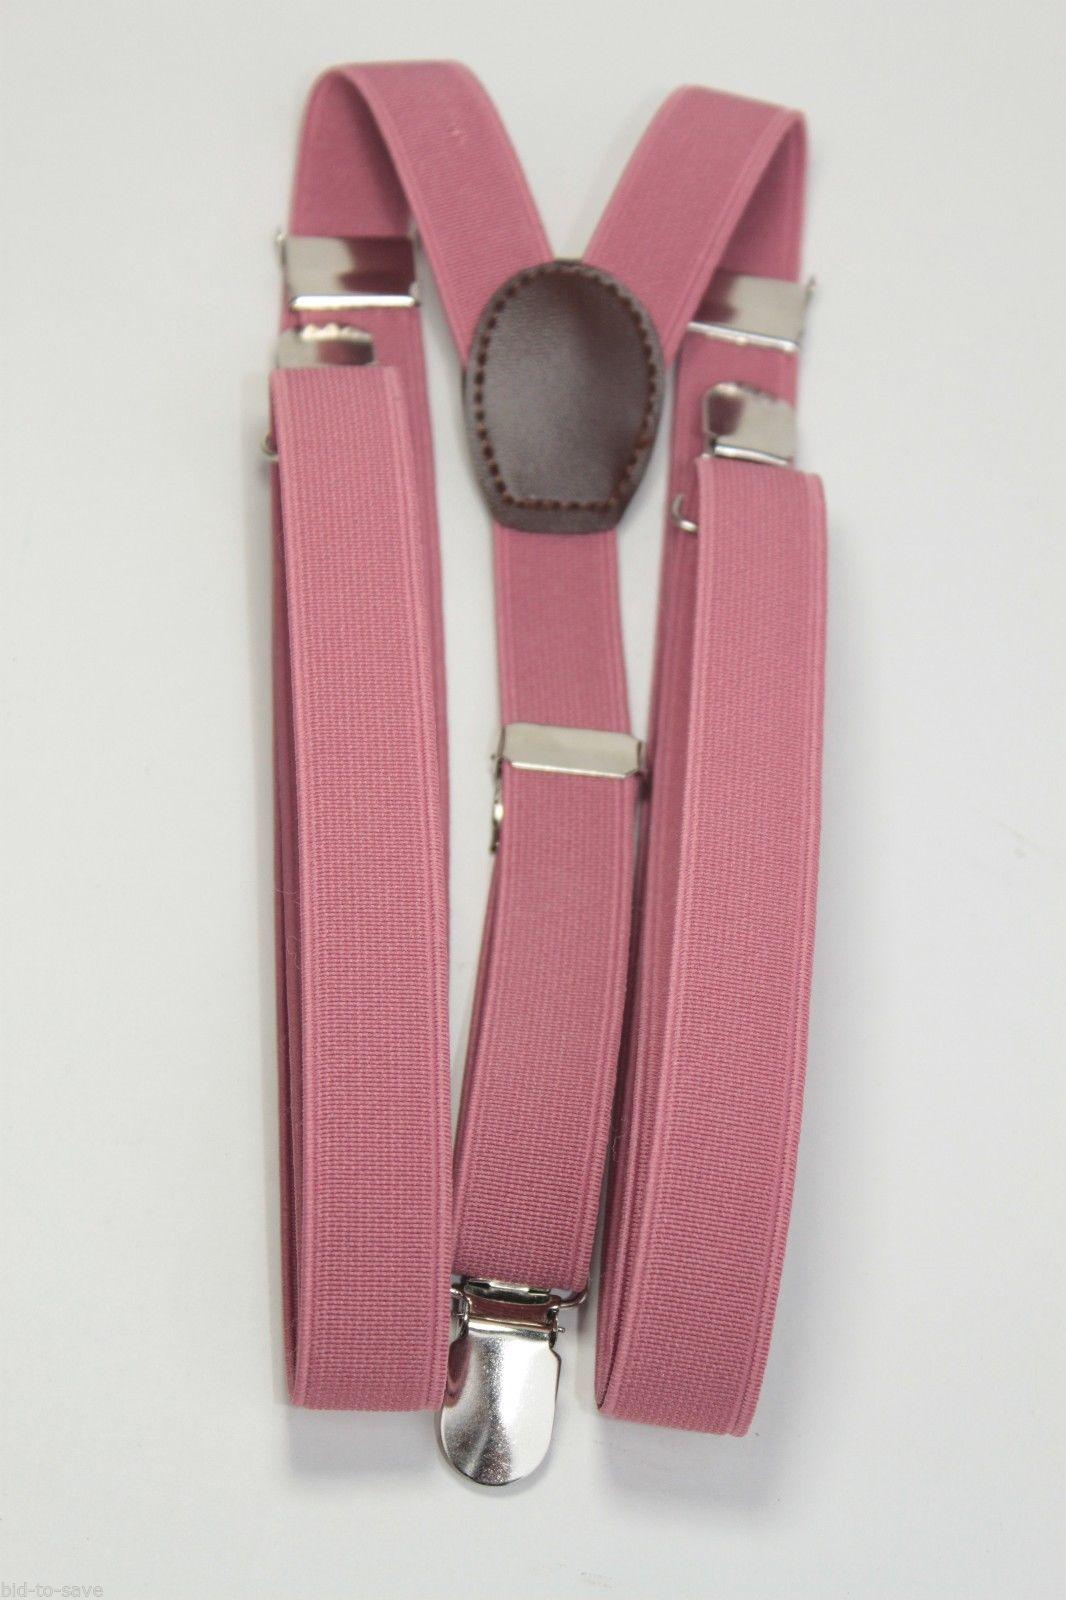 4885f1eda DARK PINK Mens Women Clip-on Suspenders Elastic Y-Shape Adjustable Braces  NEW